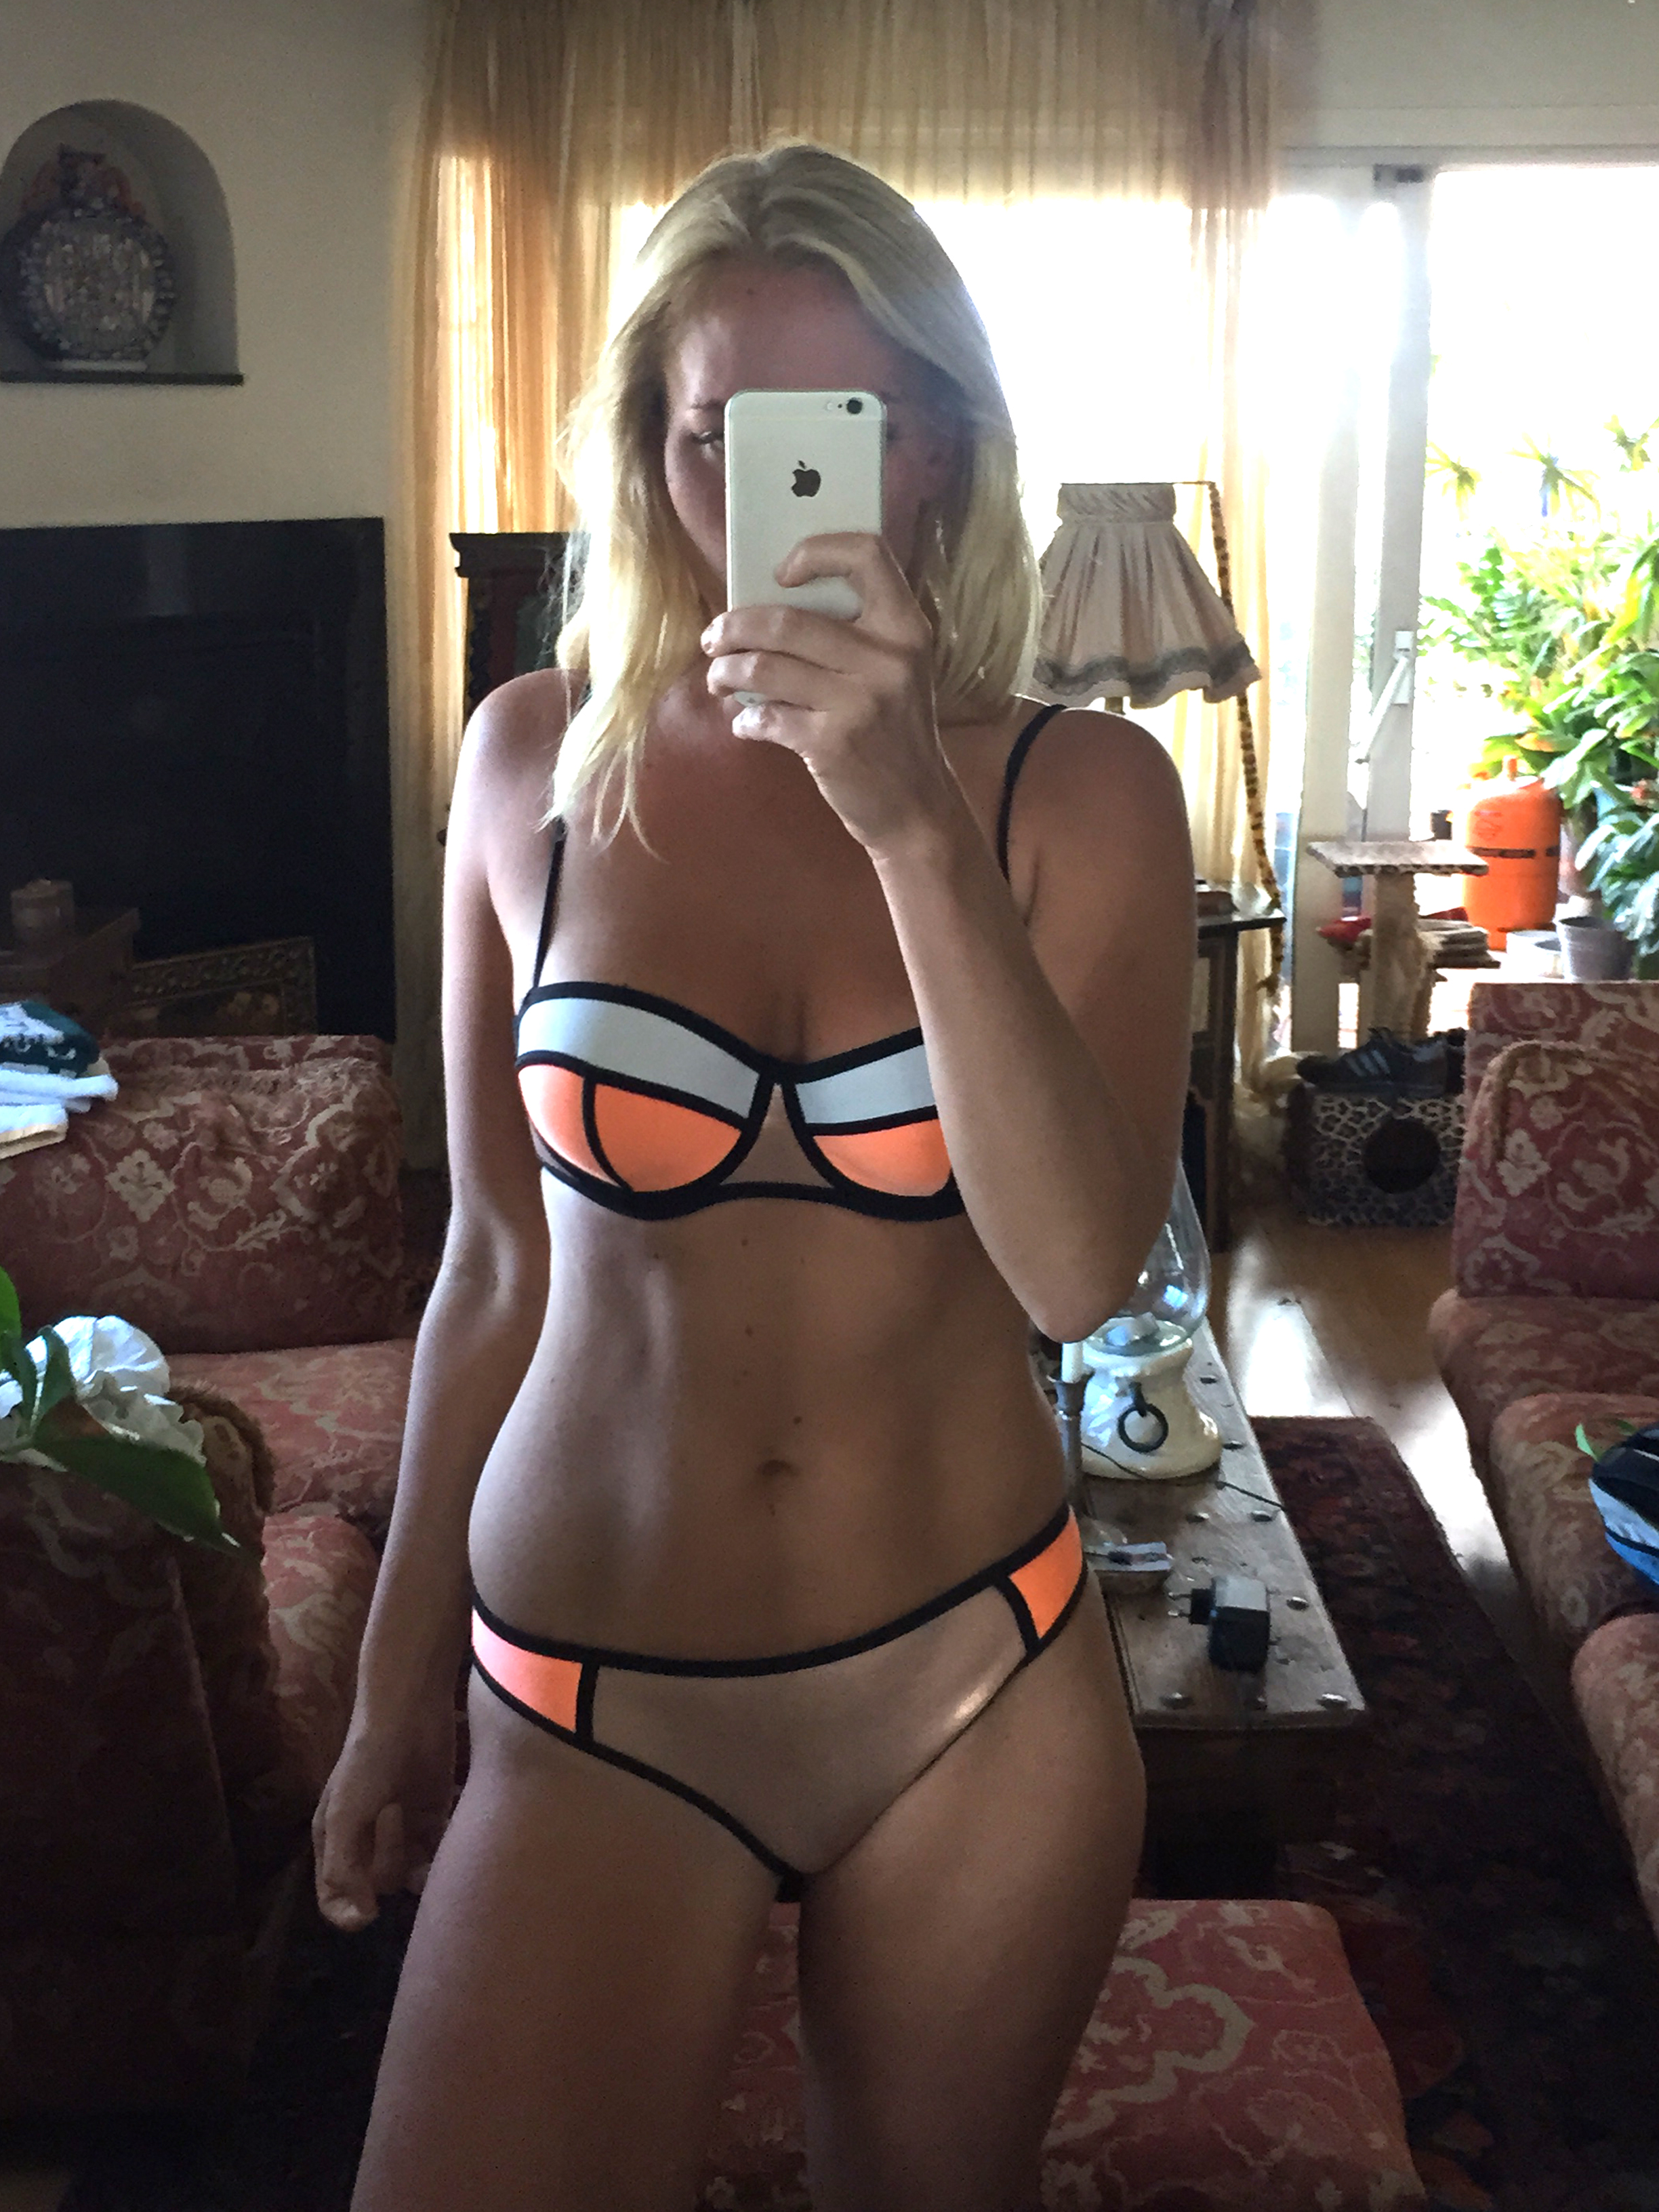 sexiga trosor bilder gratis sexkontakt